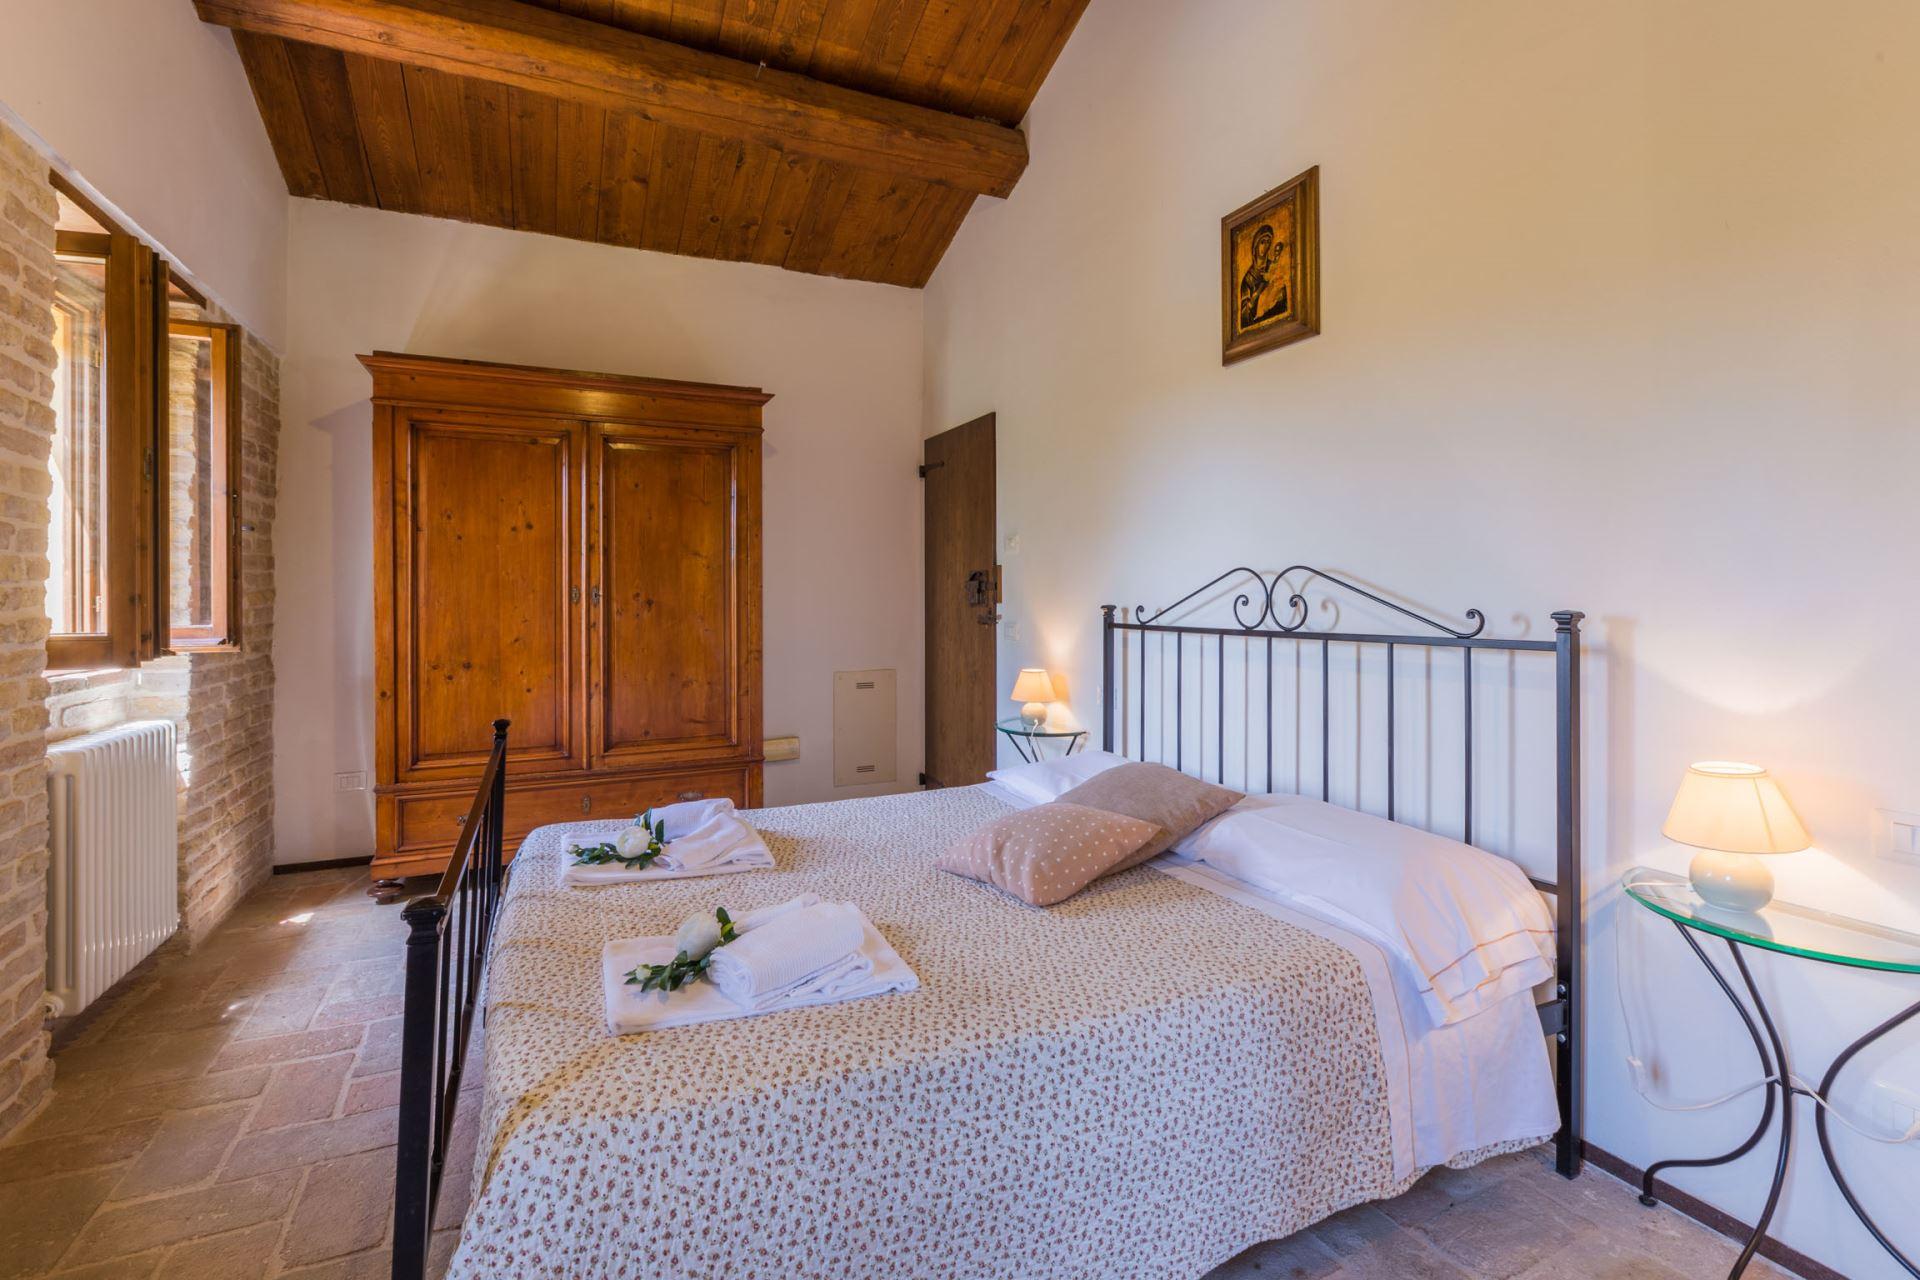 Ferienhaus VILLA DELLE VIGNE (2129909), Pesaro, Pesaro und Urbino, Marken, Italien, Bild 8